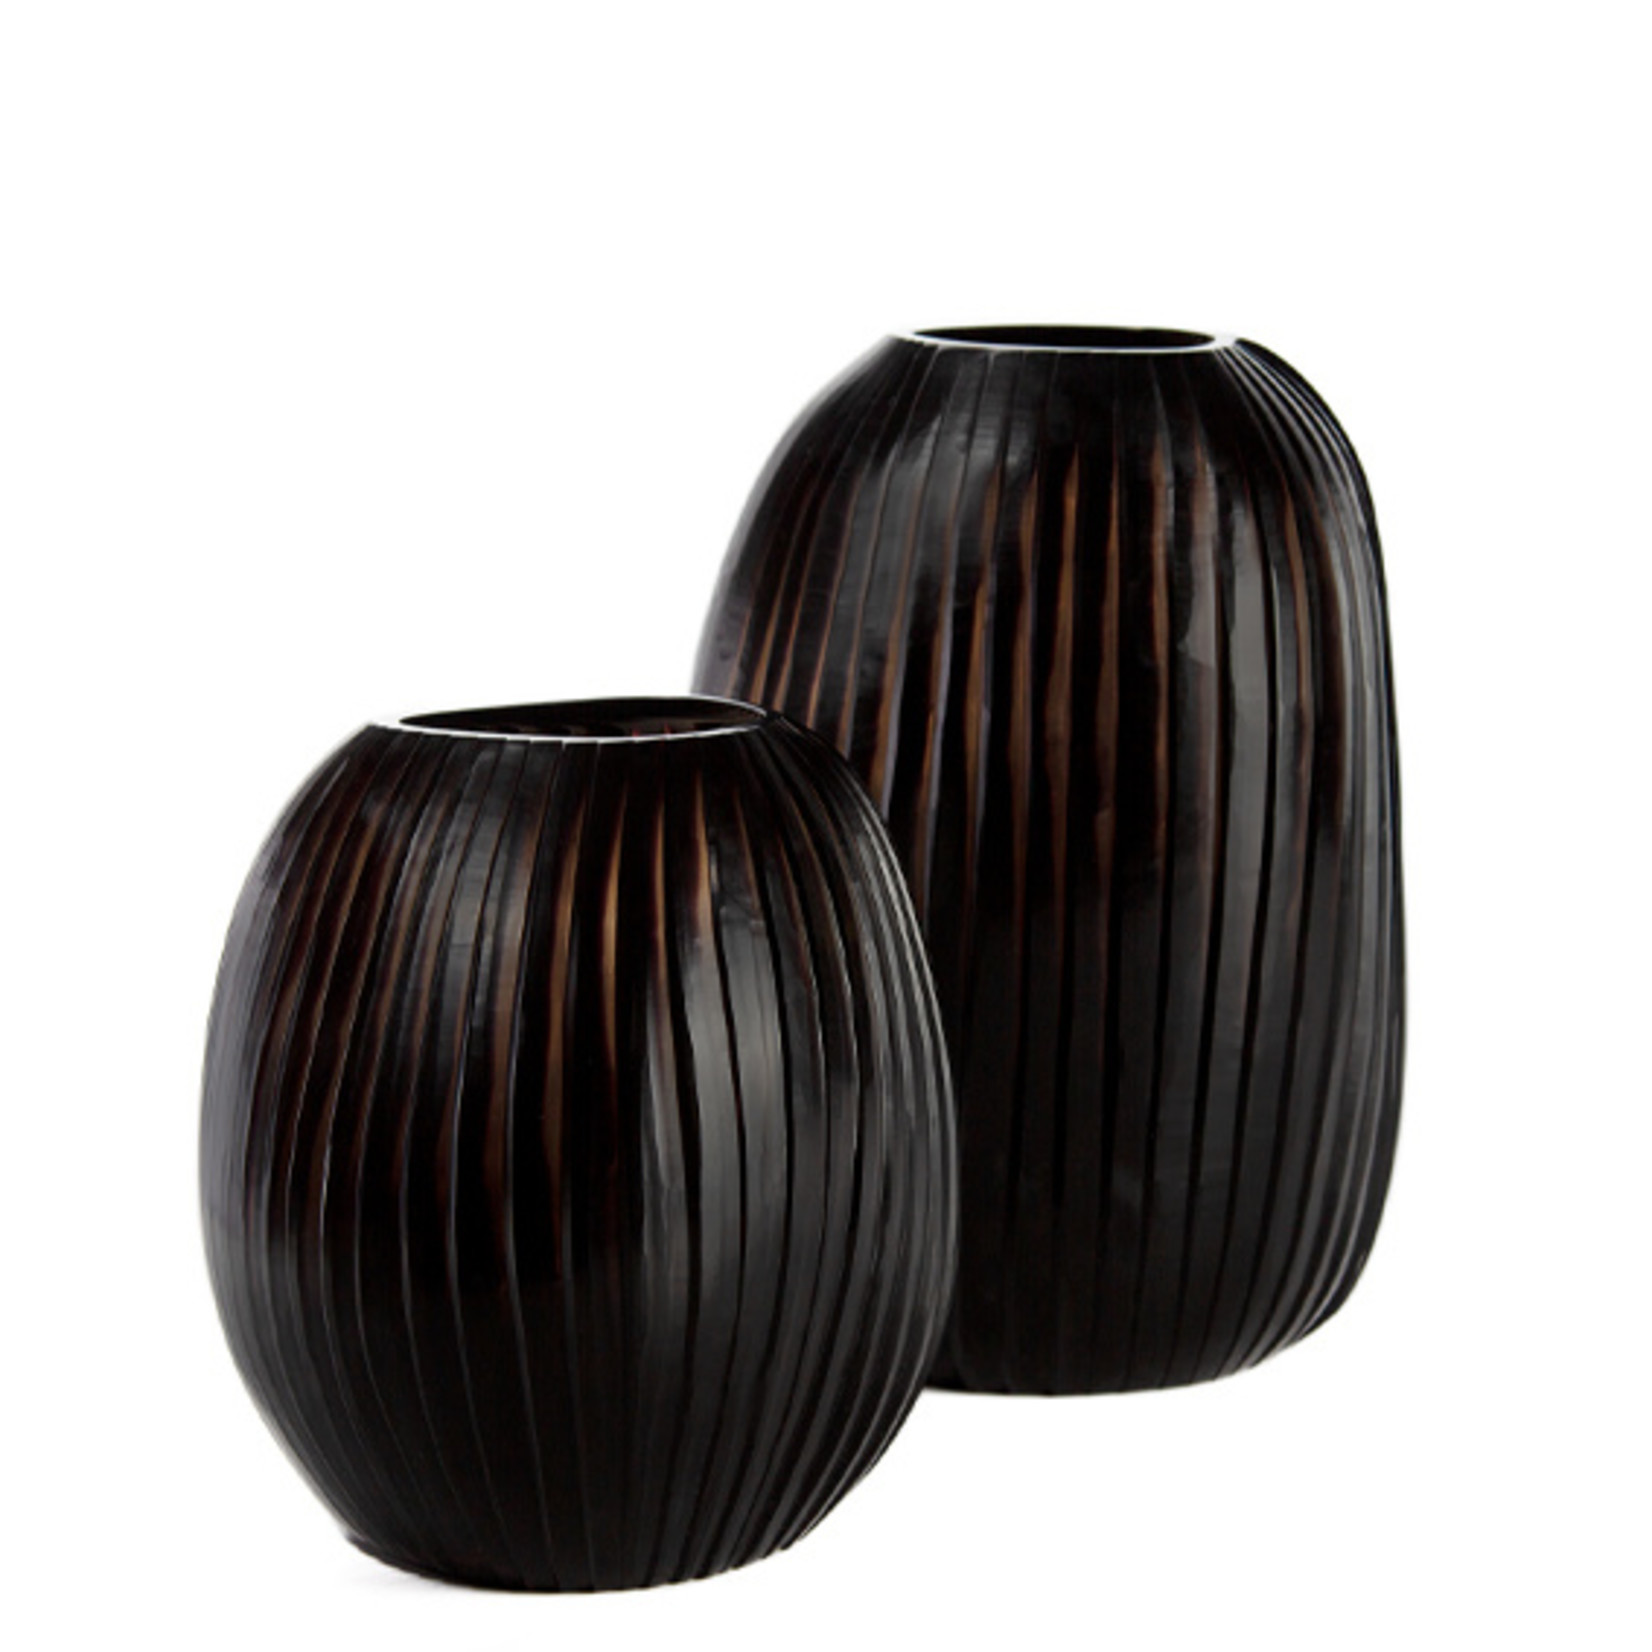 Guaxs Vase Patara Tall | Smoke Gray / Black